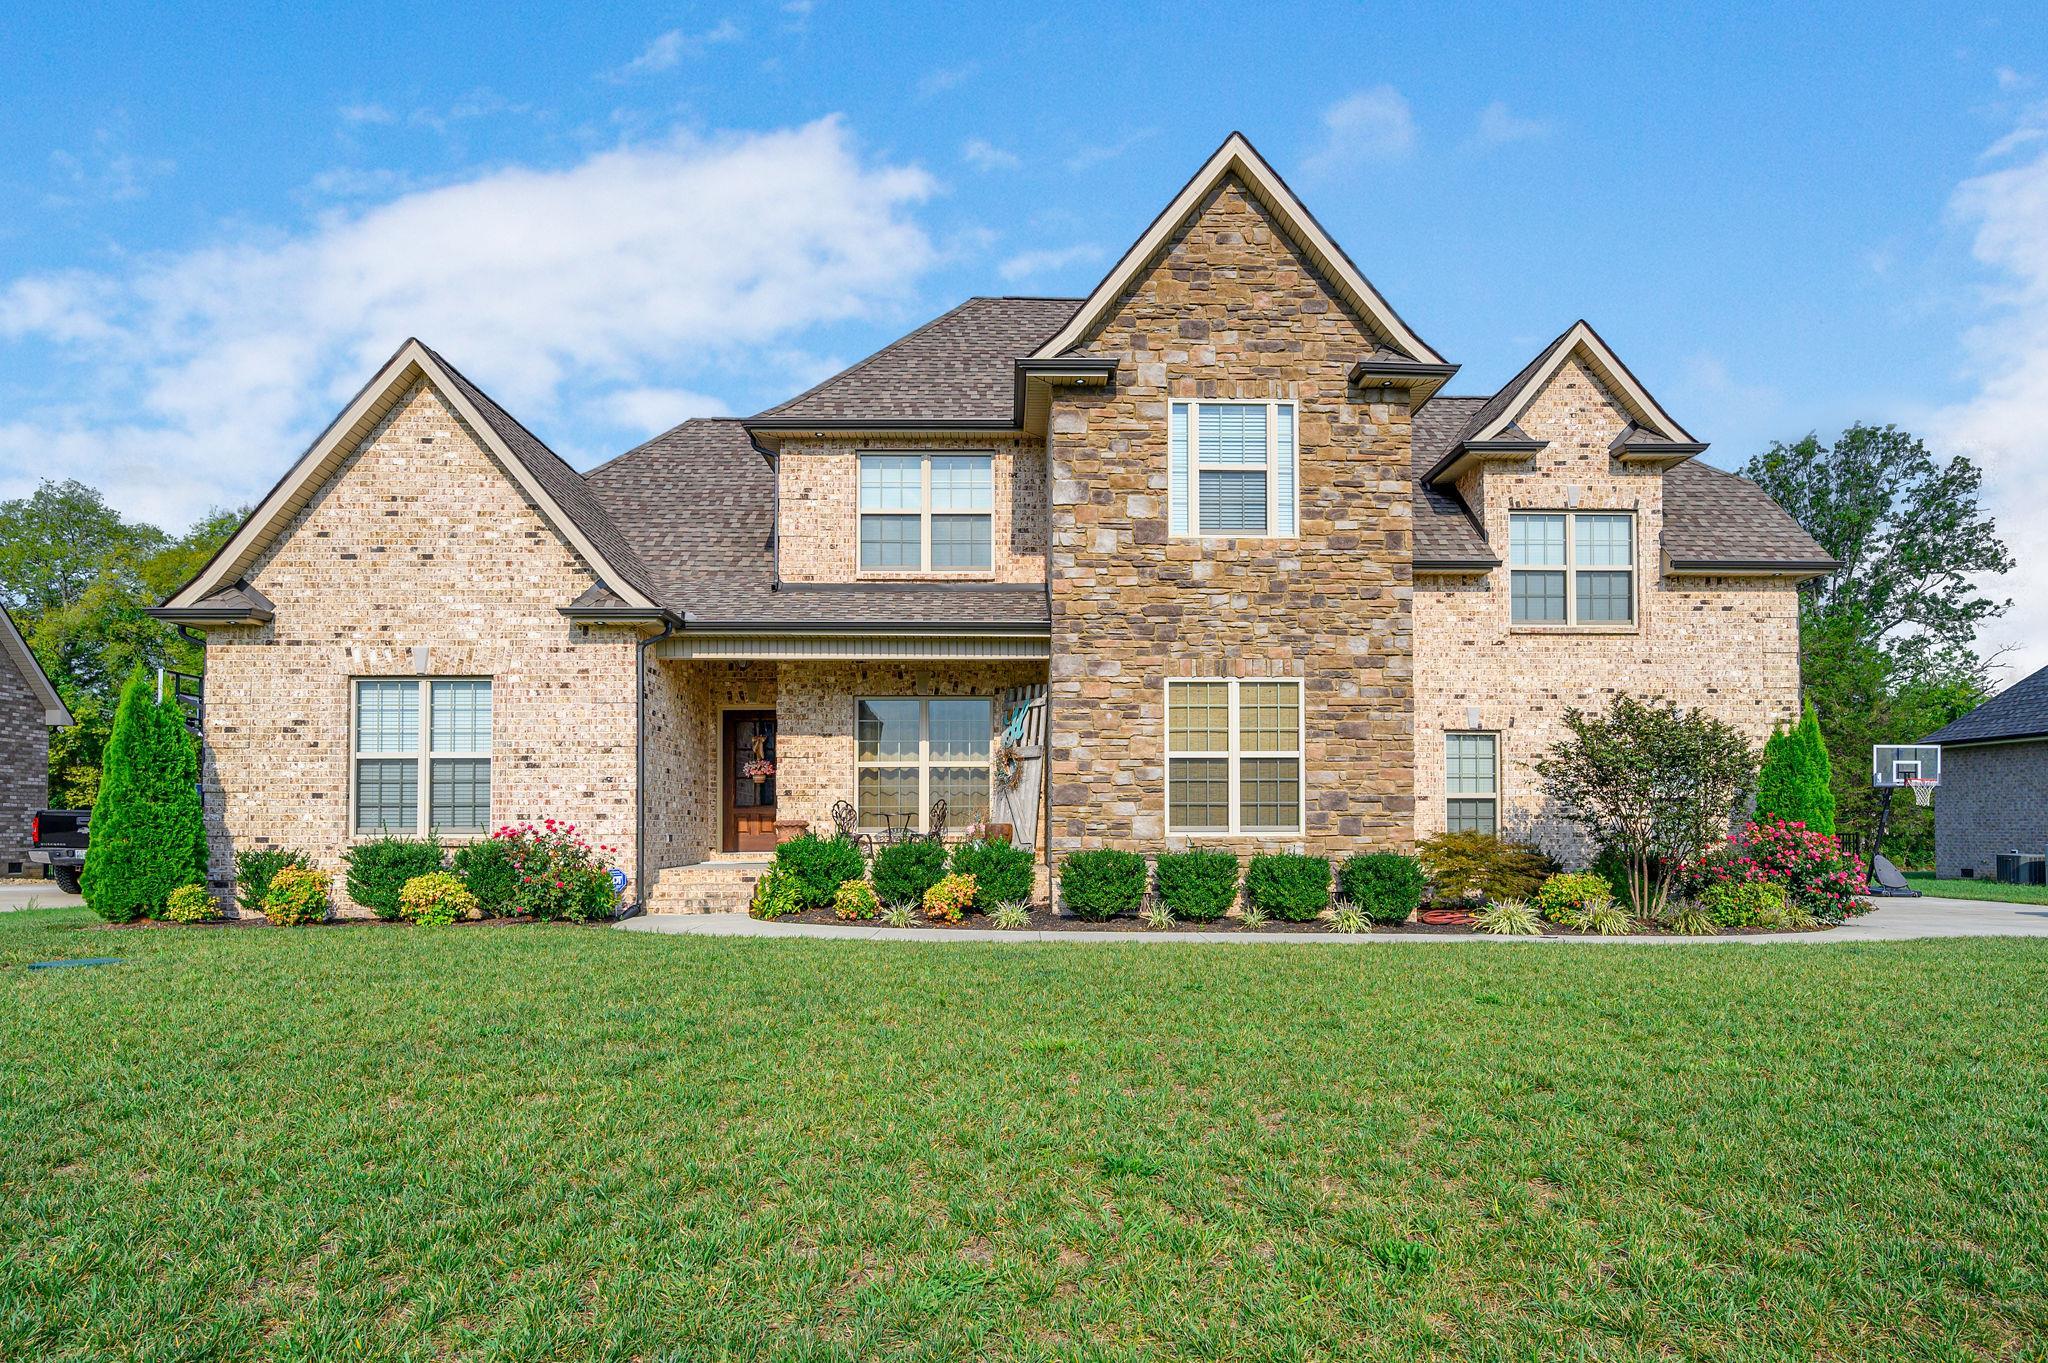 1415 Rhonda Dr, Christiana, TN 37037 - Christiana, TN real estate listing